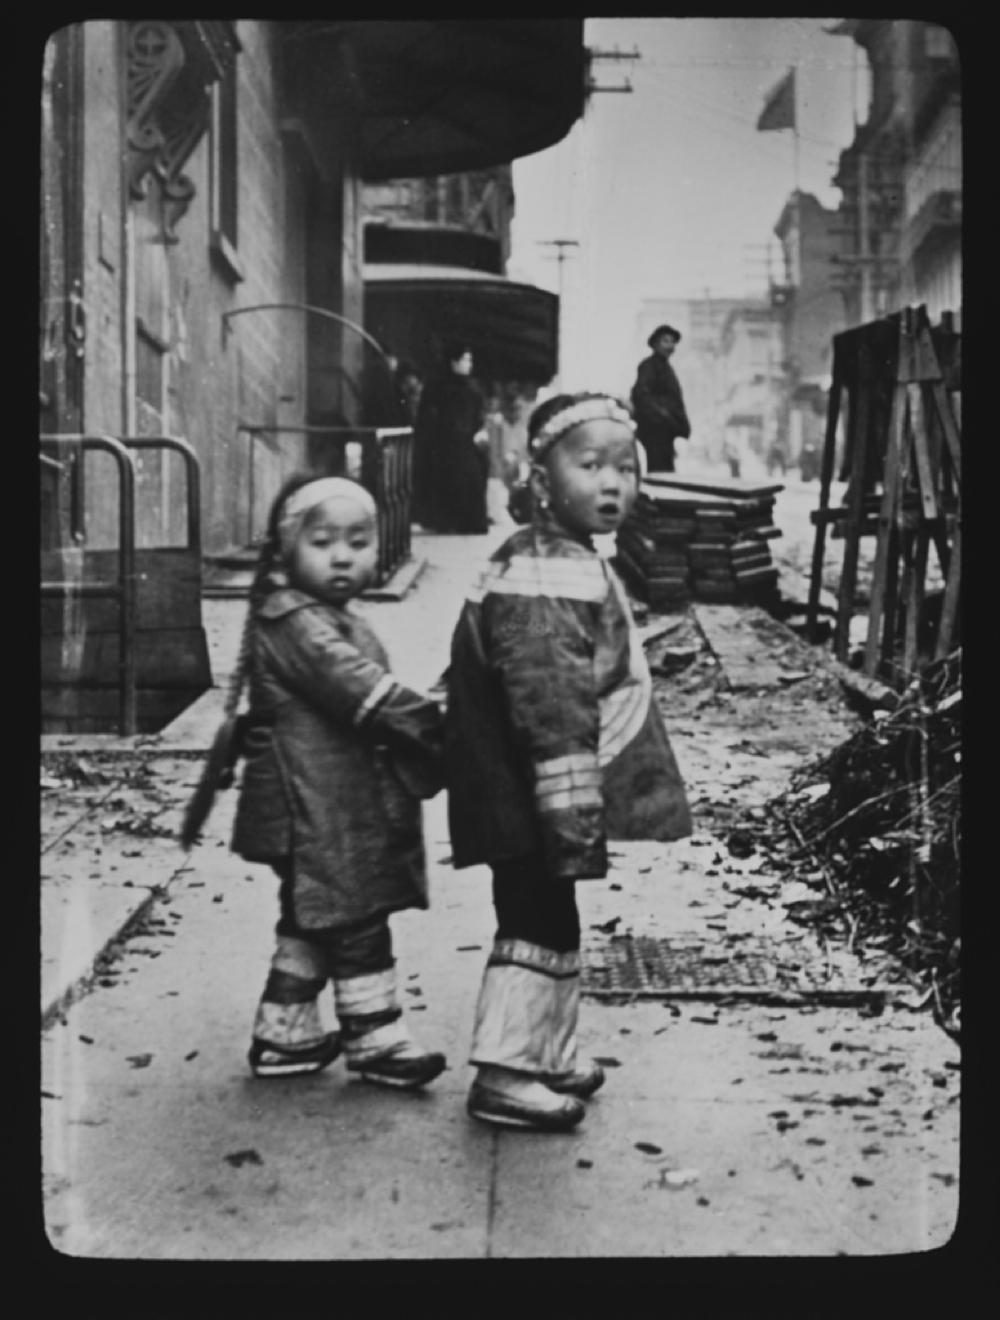 Their first photograph, Chinatown, San Francisco